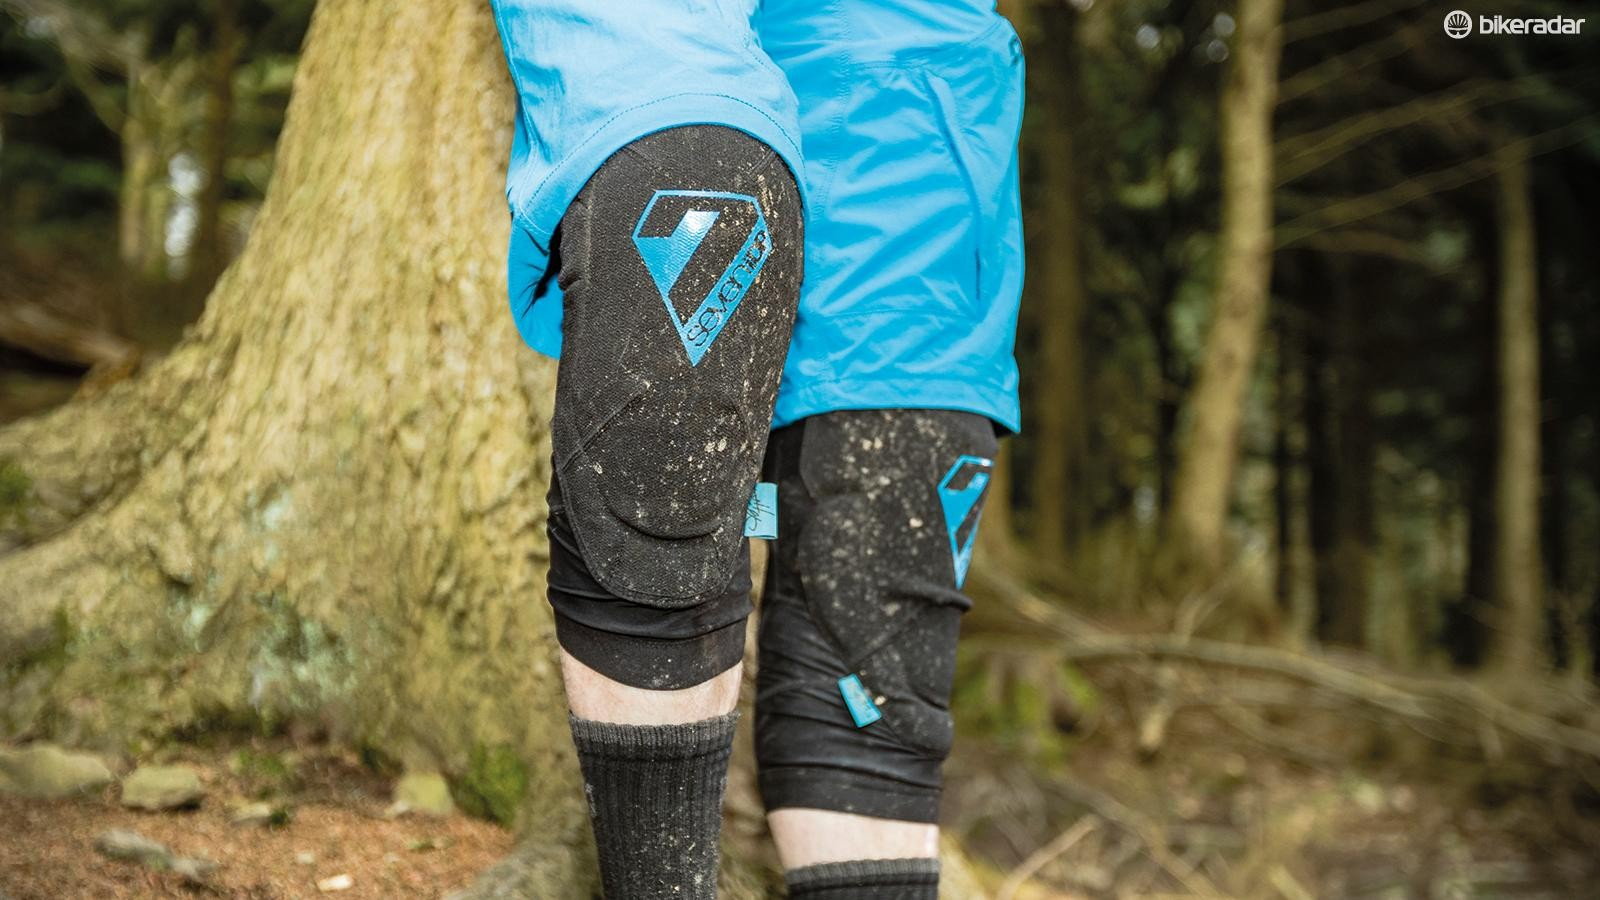 7iDP Sam Hill knee pads